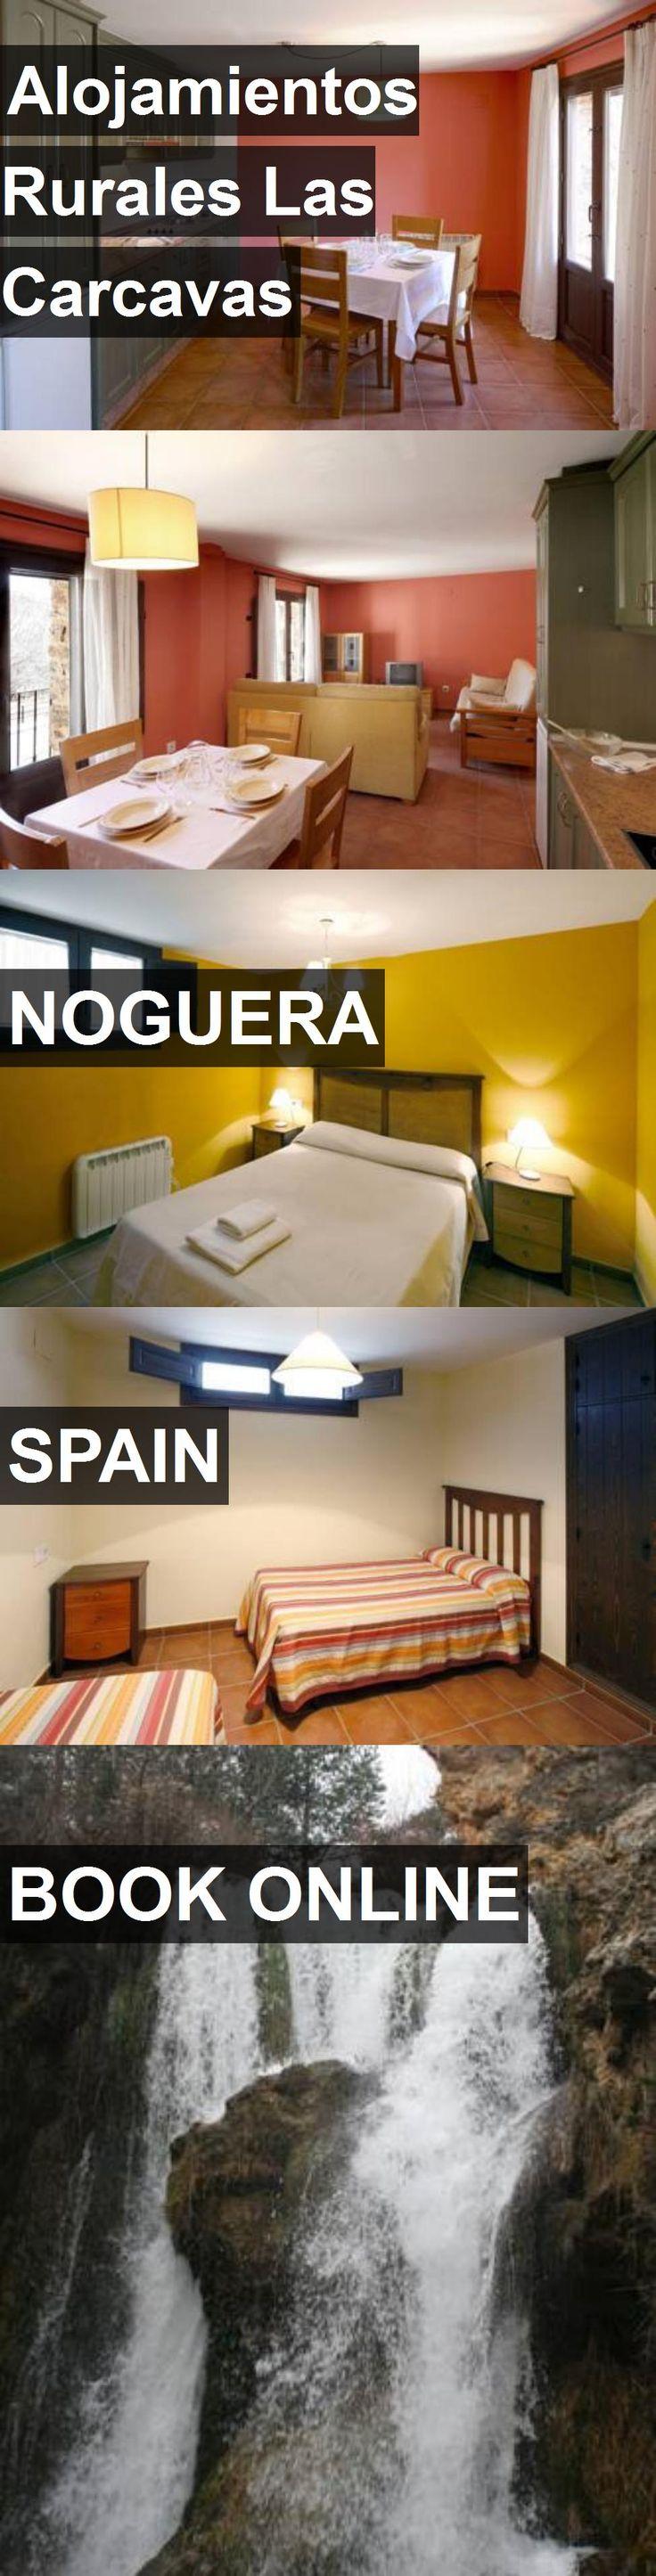 Hotel Alojamientos Rurales Las Carcavas in Noguera, Spain. For more information, photos, reviews and best prices please follow the link. #Spain #Noguera #travel #vacation #hotel